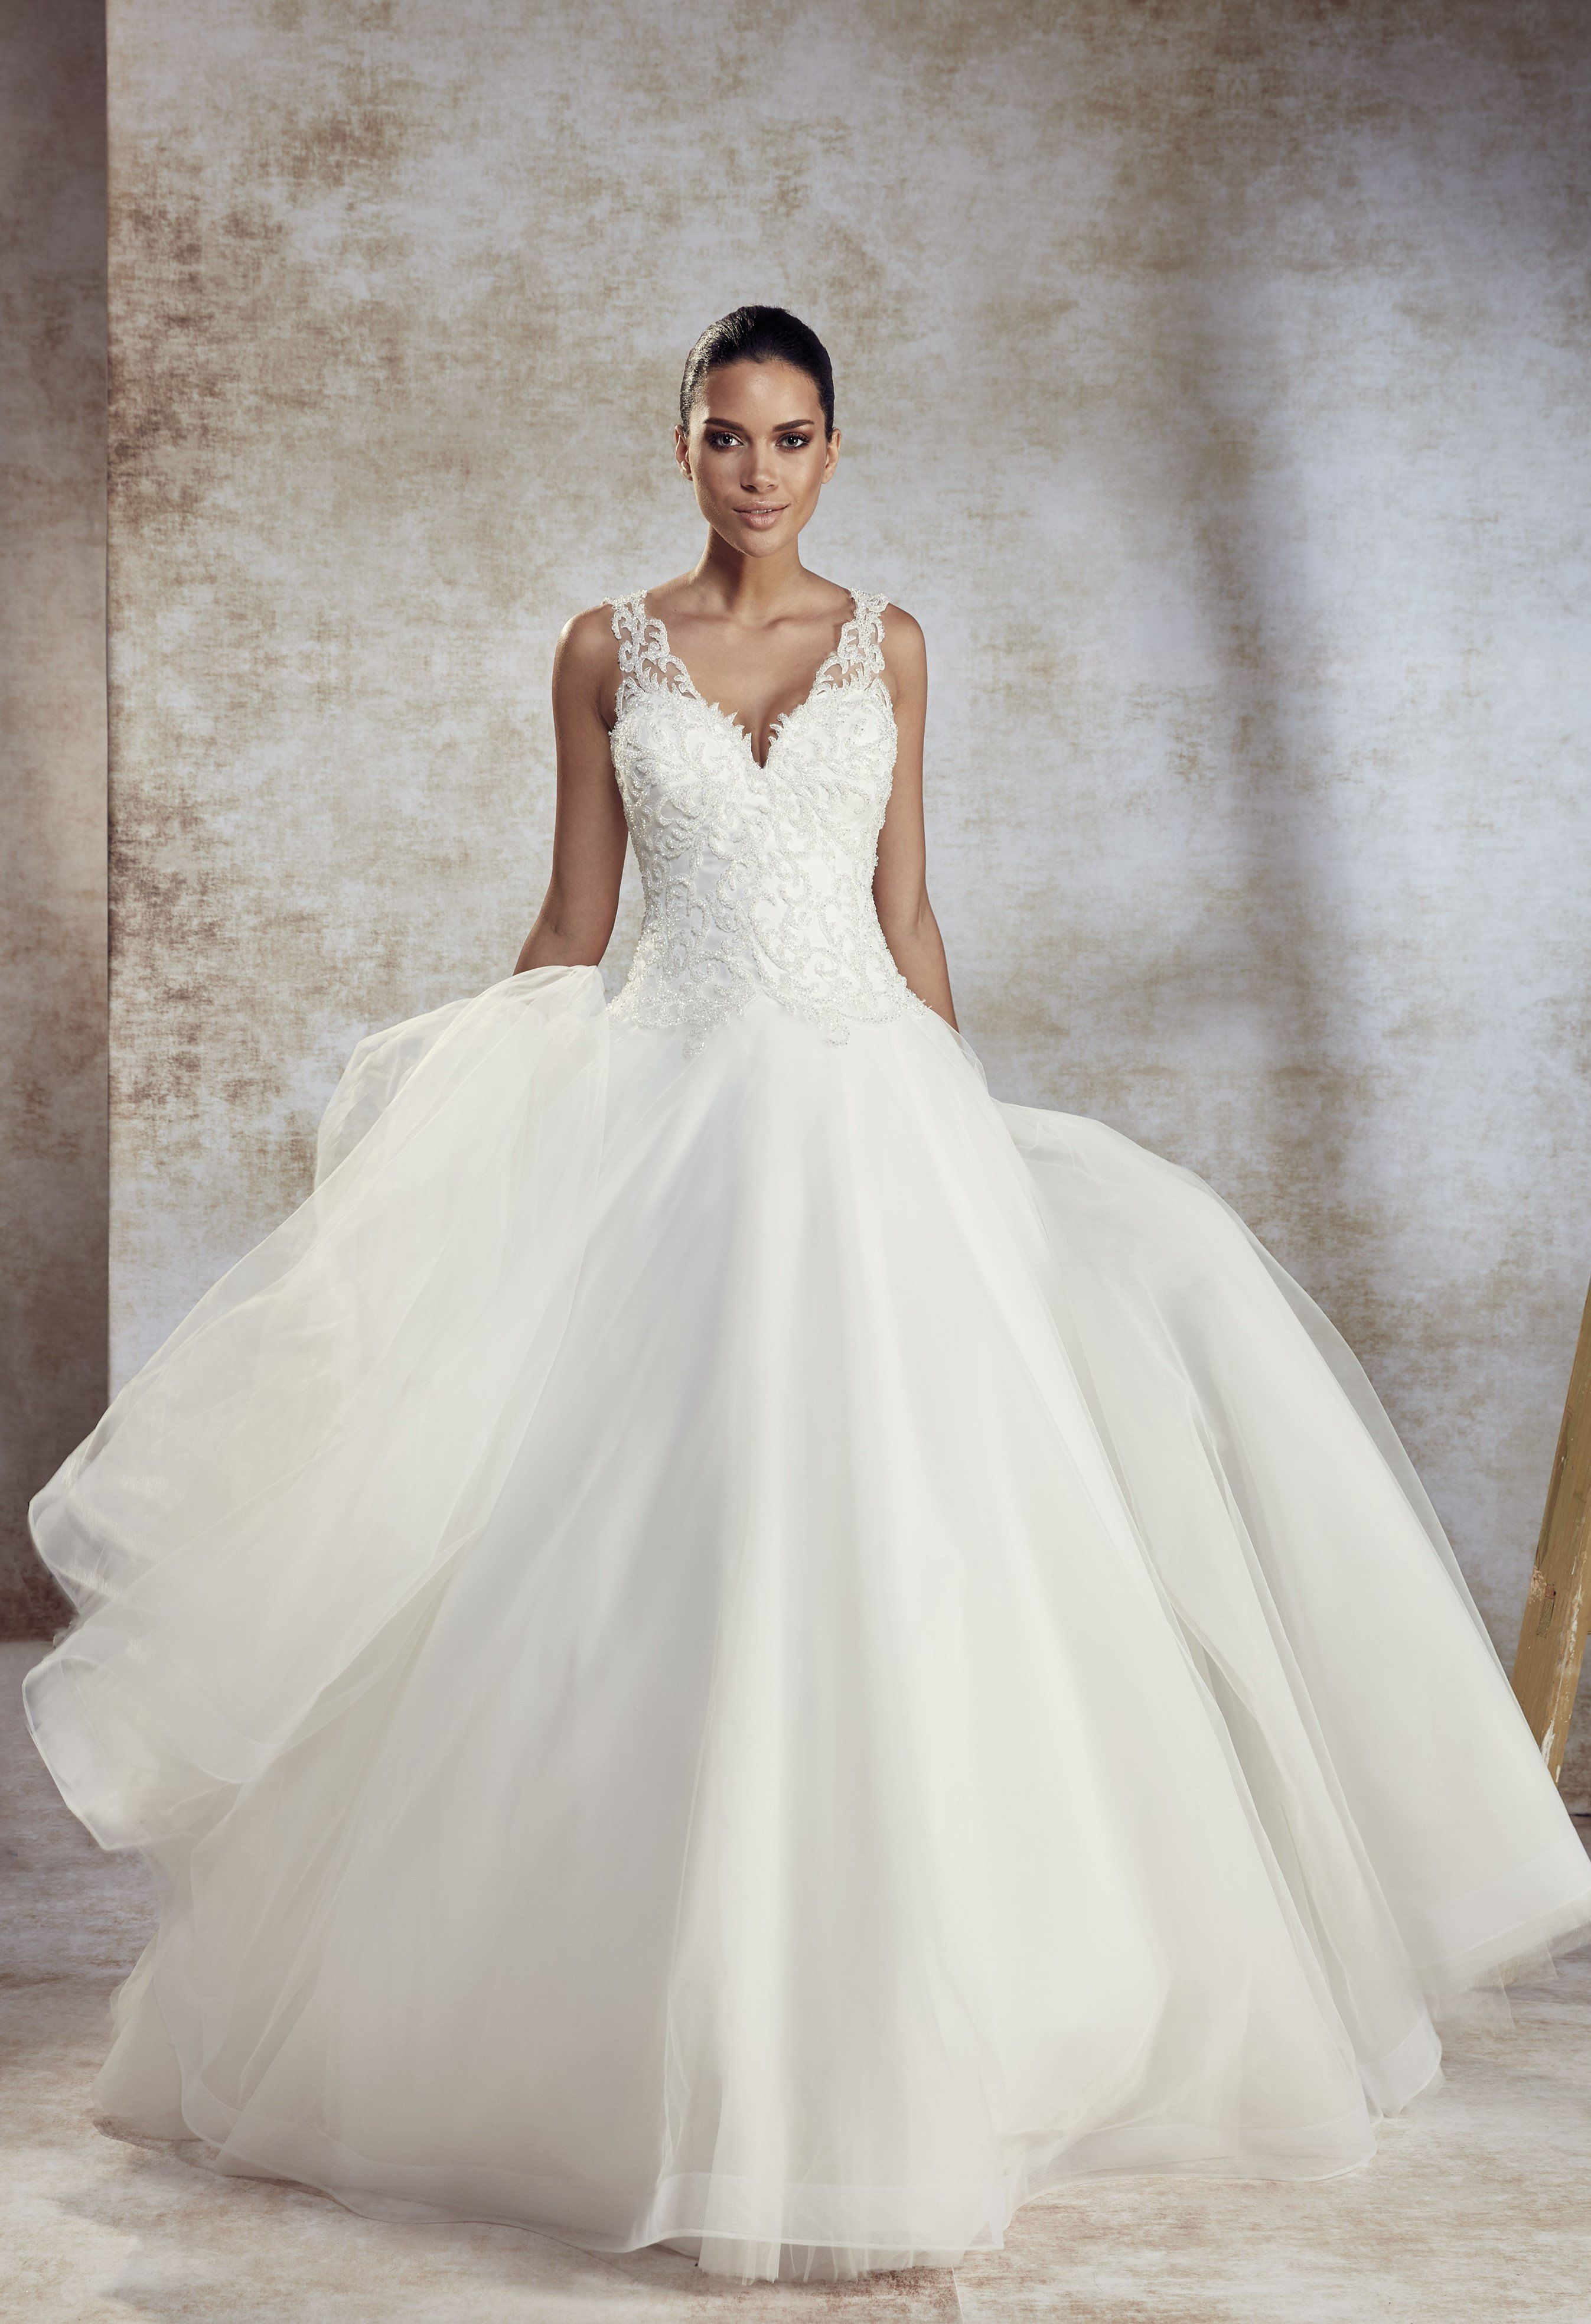 Jana Ann Couture Fall 2017 Wedding Dress collection. Bridal